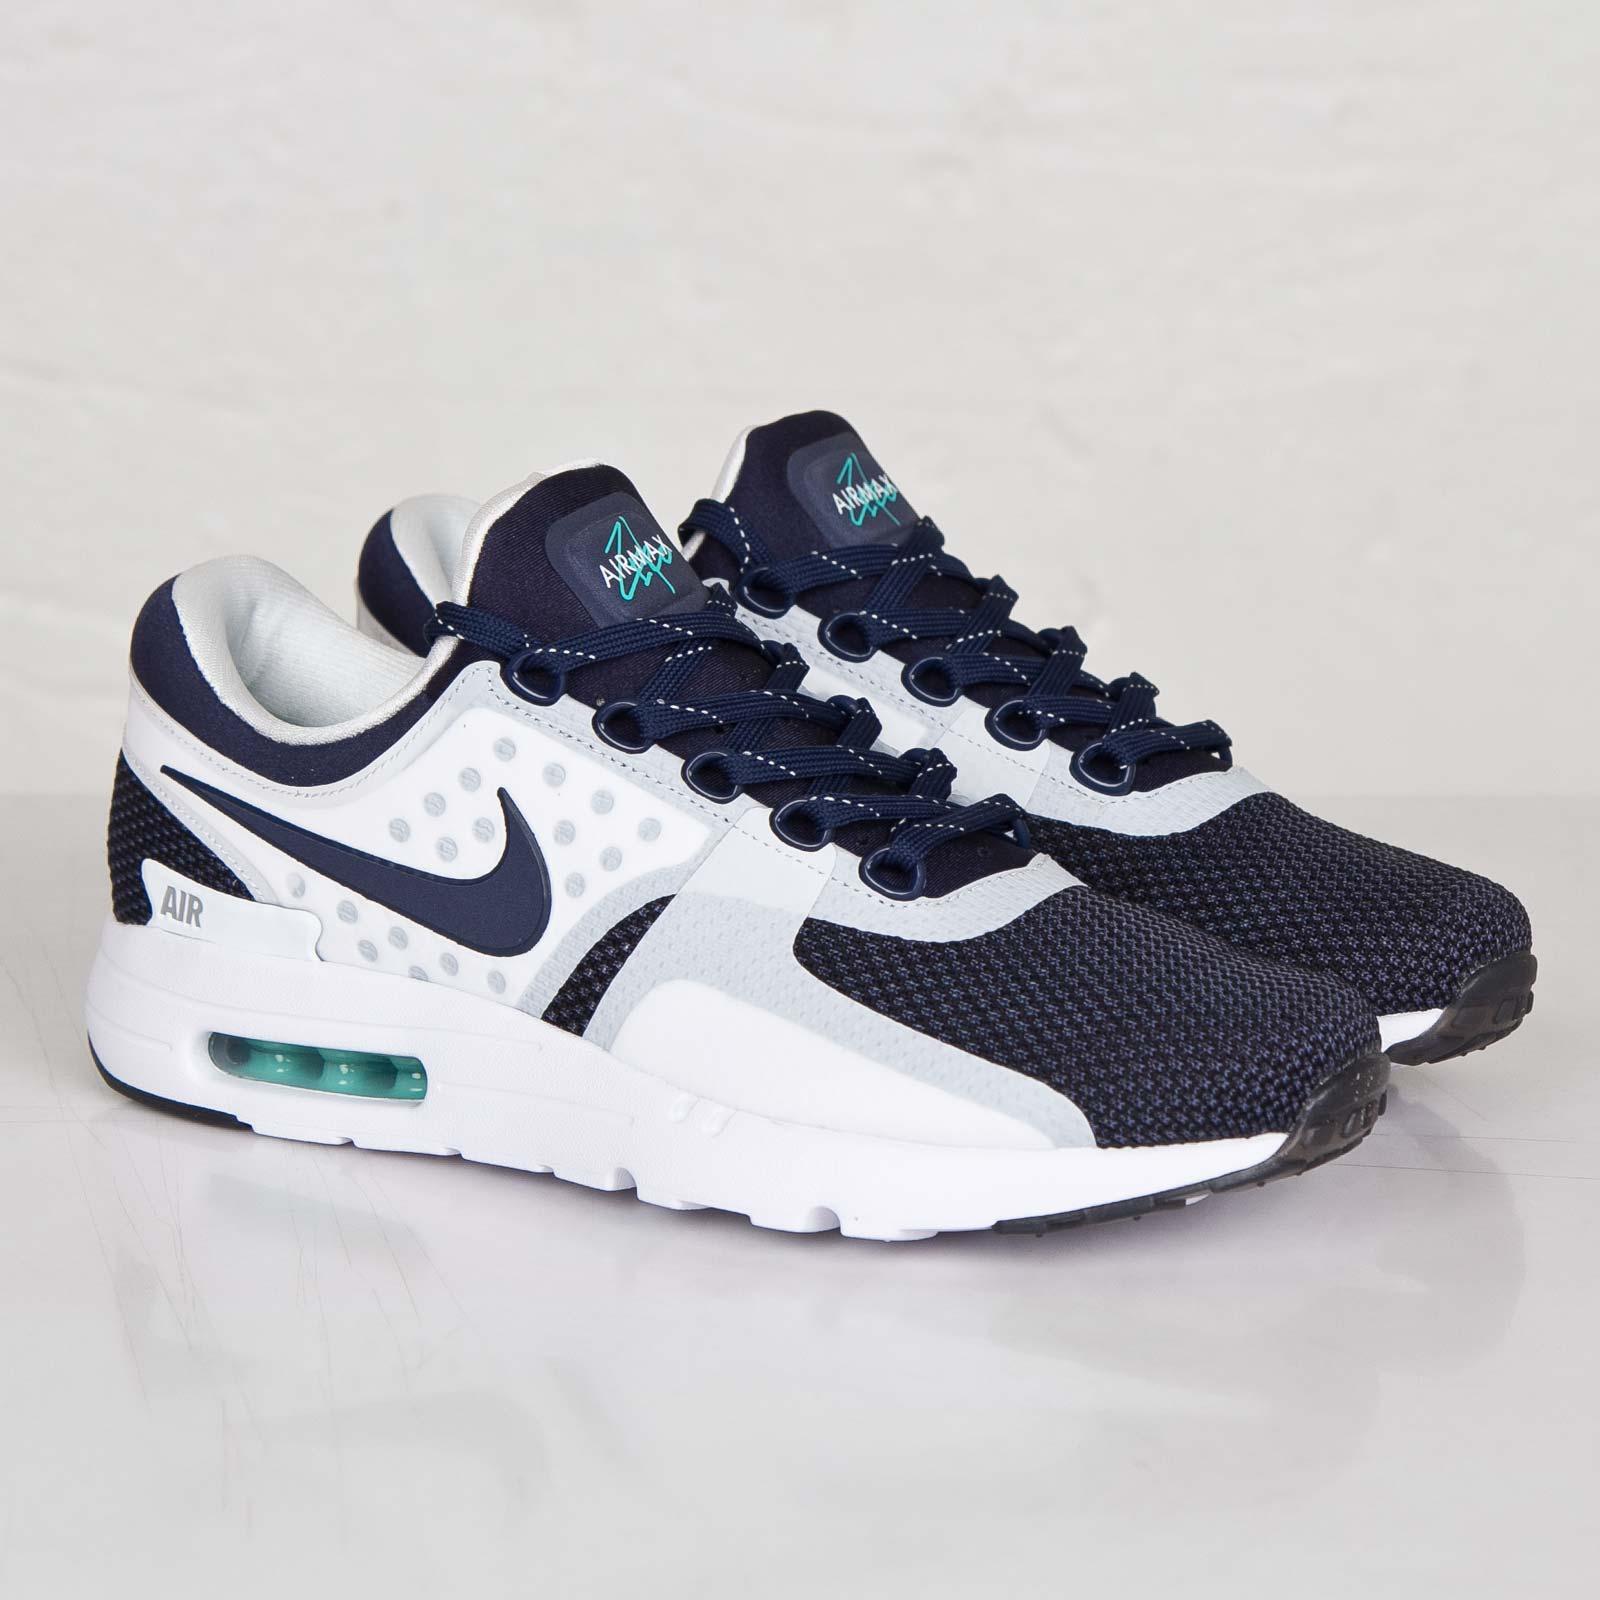 a91778a8a1 Nike Air Max Zero QS - 789695-104 - Sneakersnstuff | sneakers ...